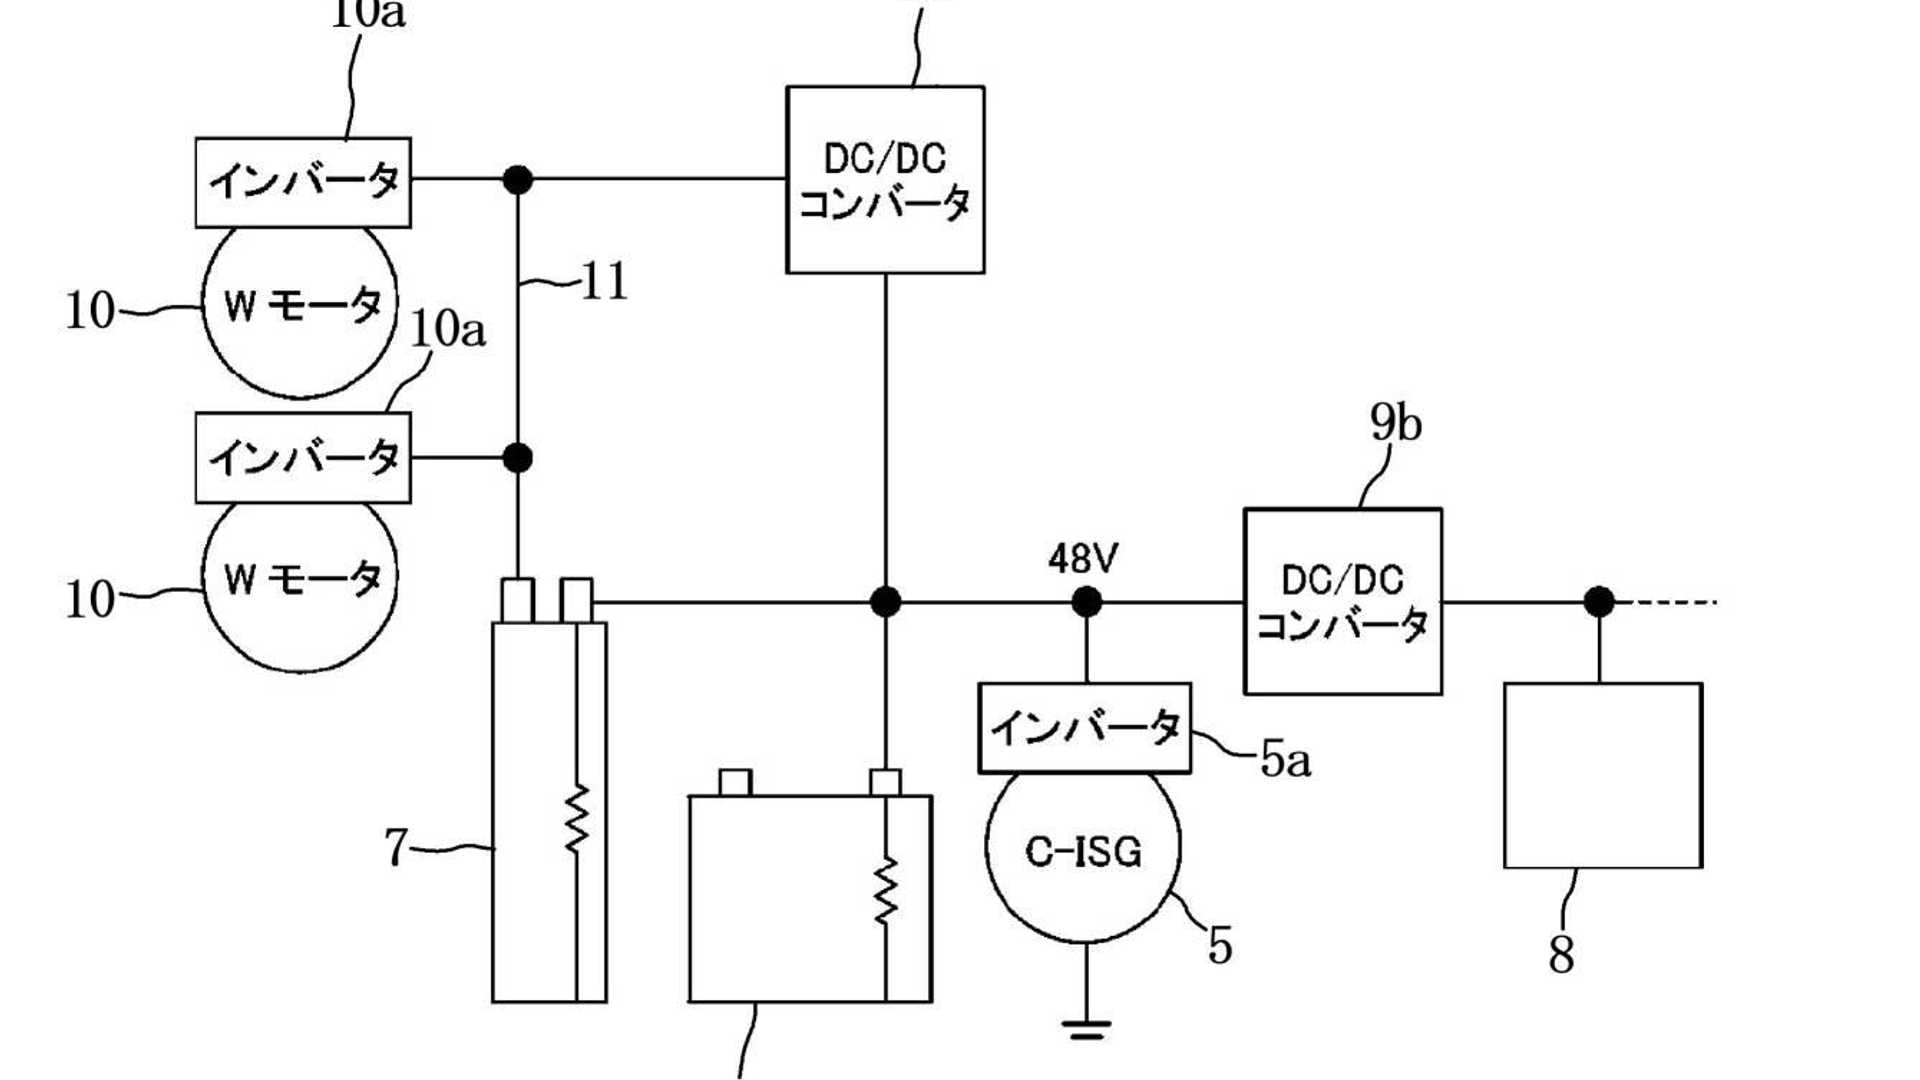 Mazda-Rotary-Engine-Hybrid-Patent-5